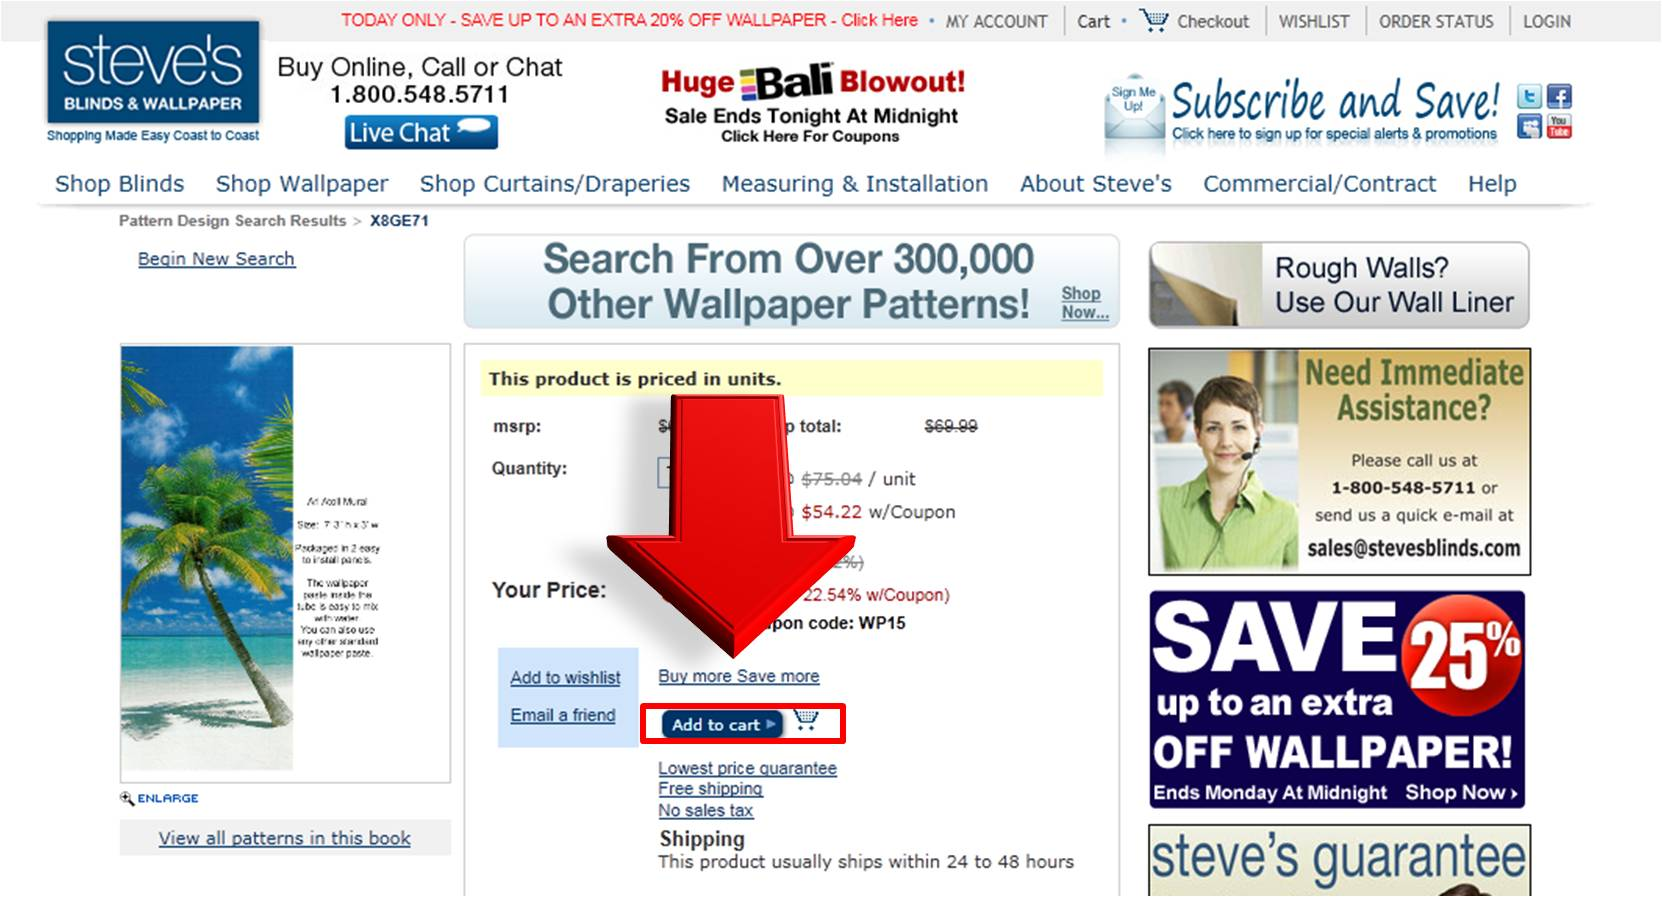 StevesBlindsandWallpaper Coupon Code Coupon Online Codes 1662x897